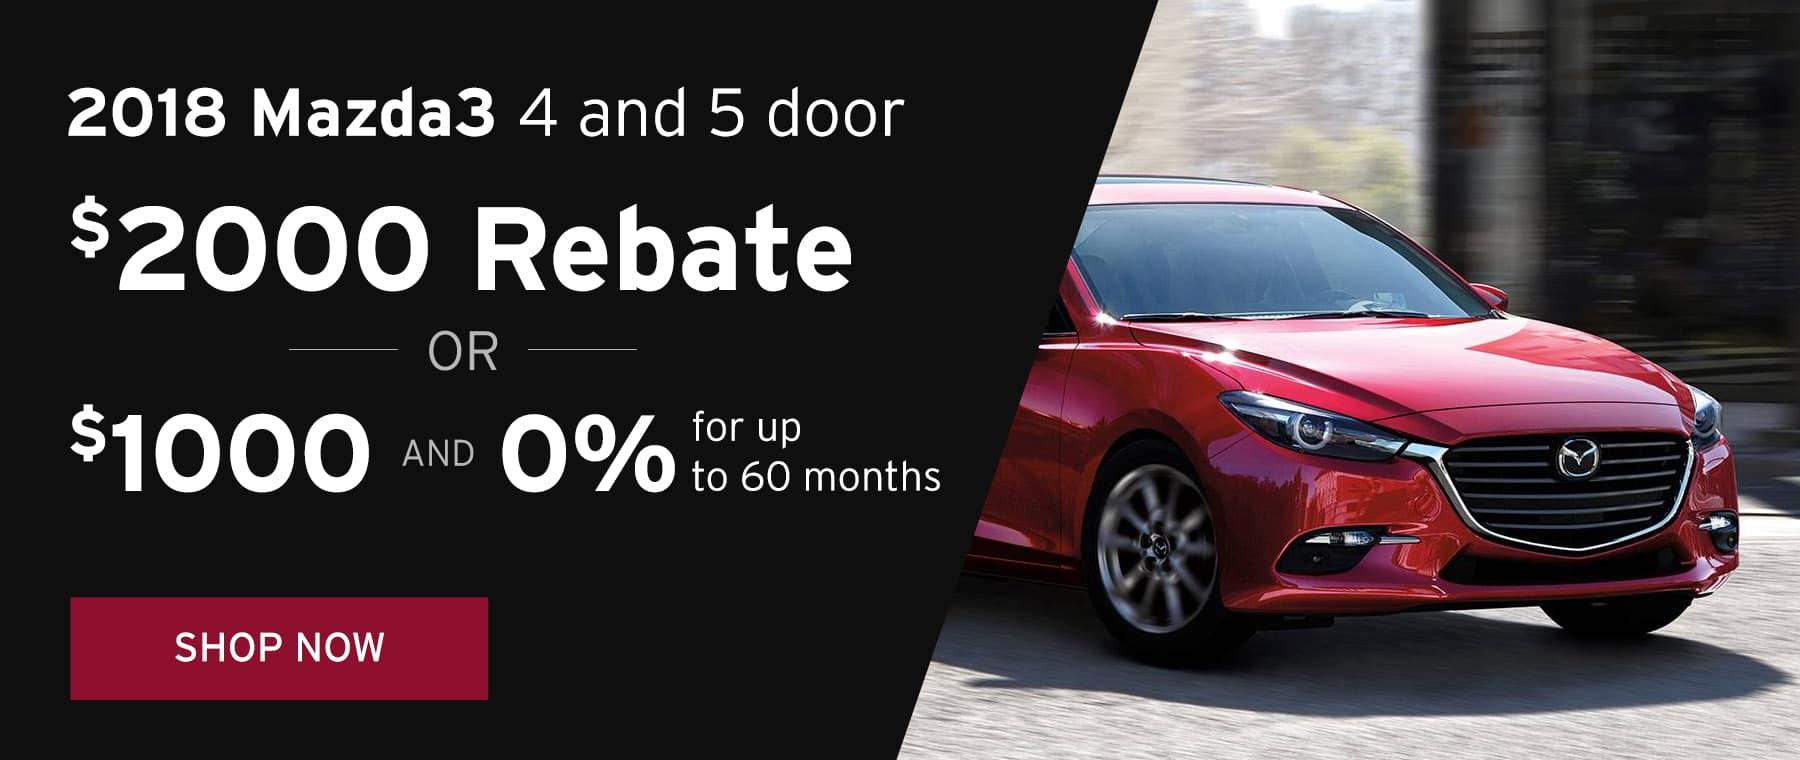 June Mazda3 4/5 Offer